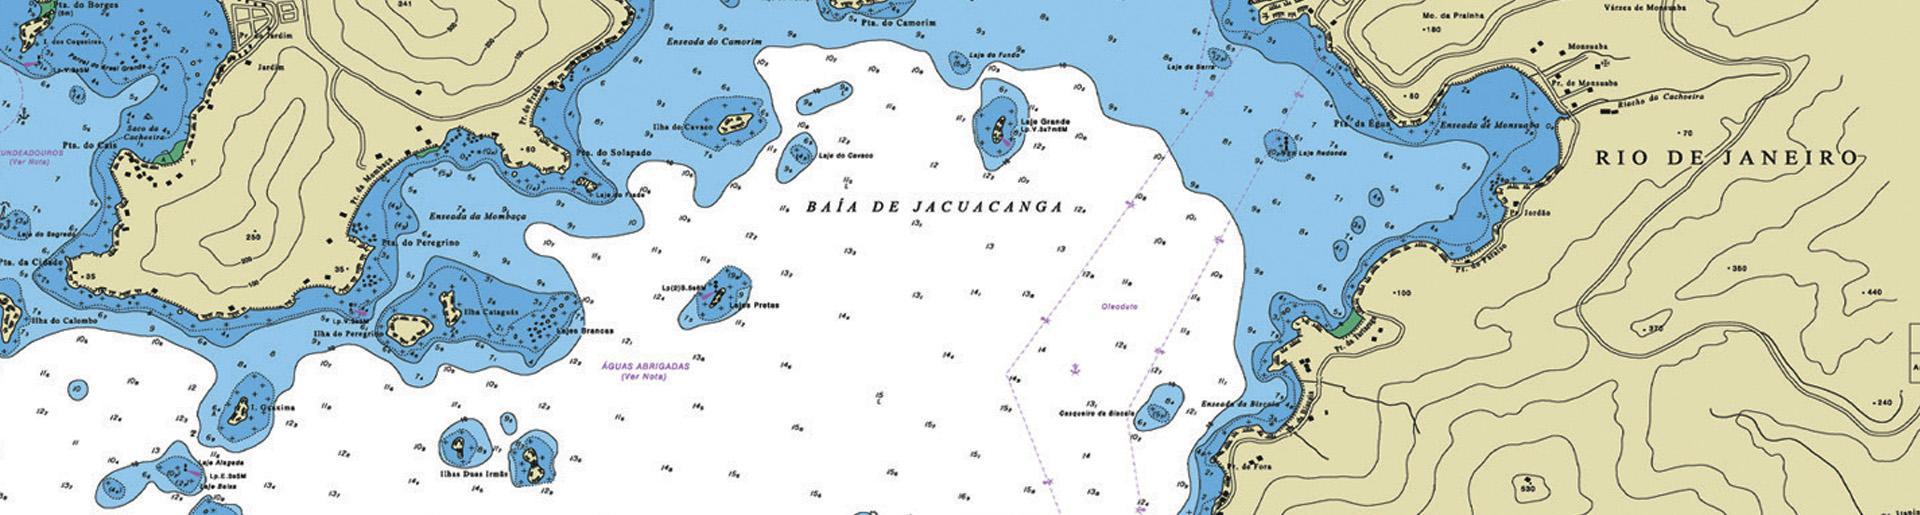 https://www.marinha.mil.br/emgepron/pt-br/www.cartasnauticasbrasil.com.br